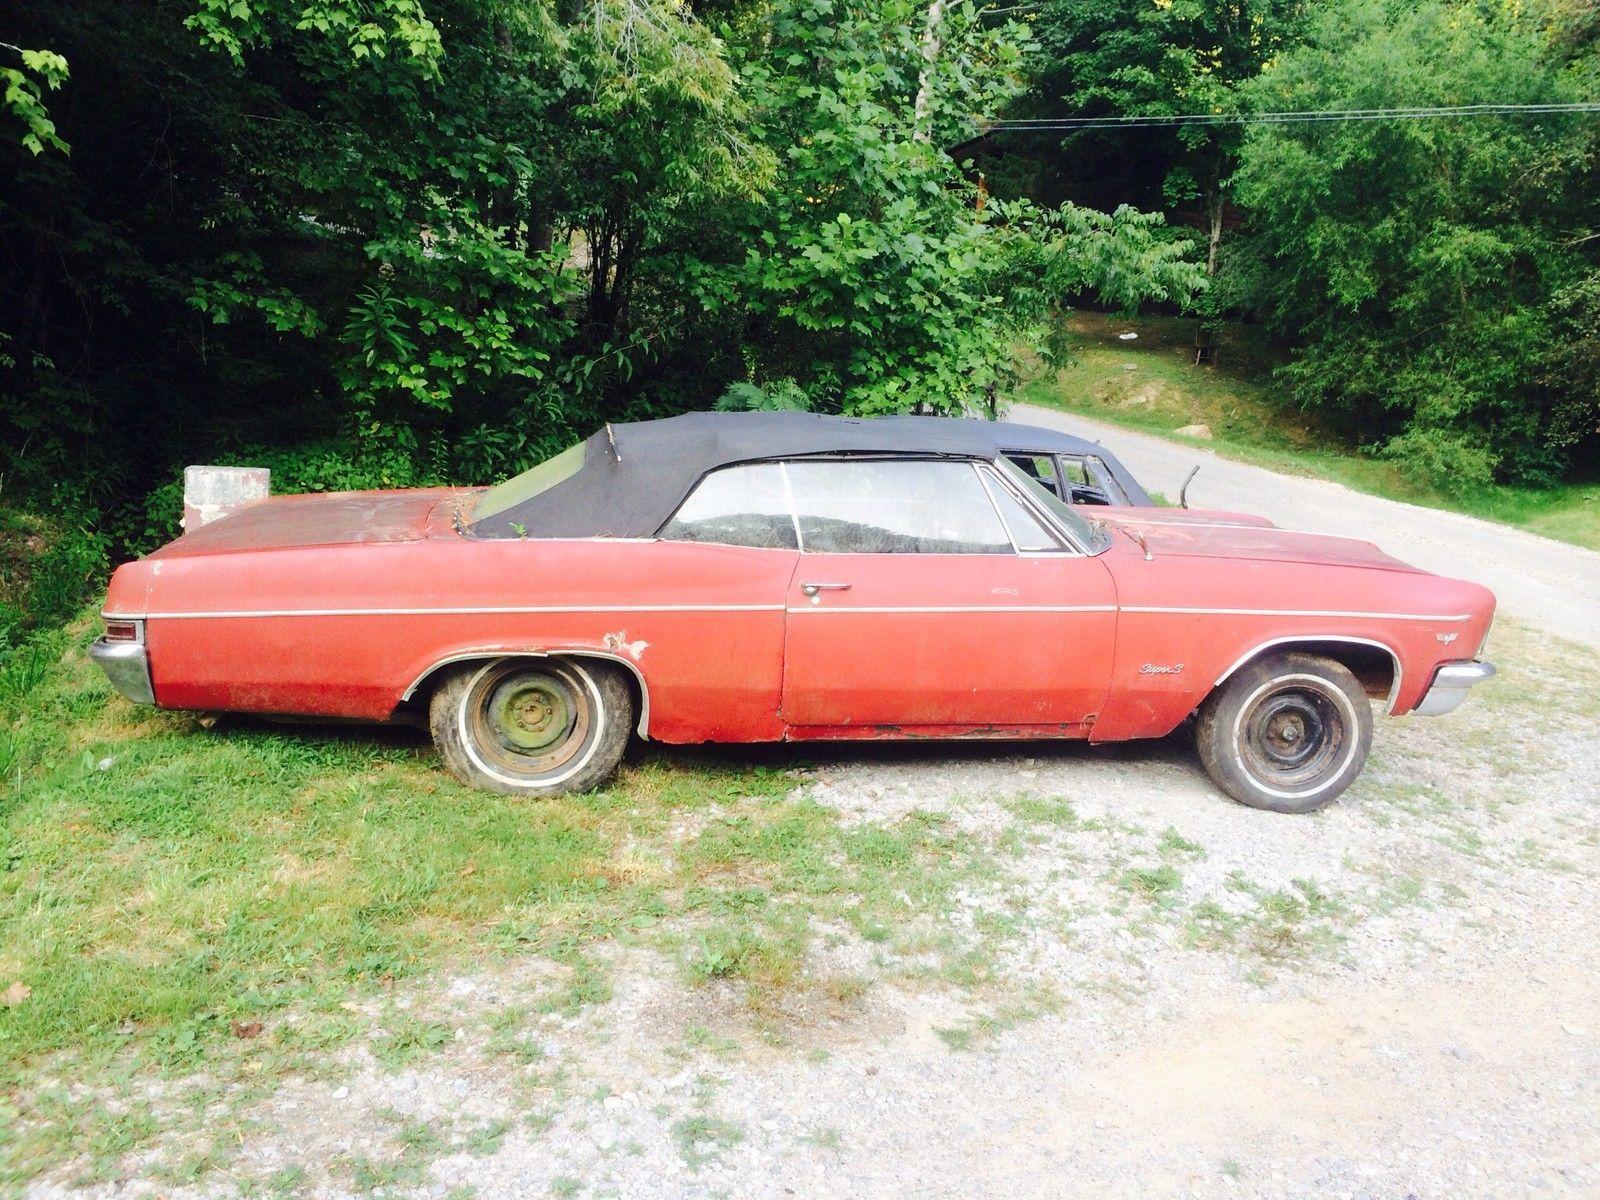 1966 Impala Convertible | Needs Rescued | Pinterest | Convertible ...